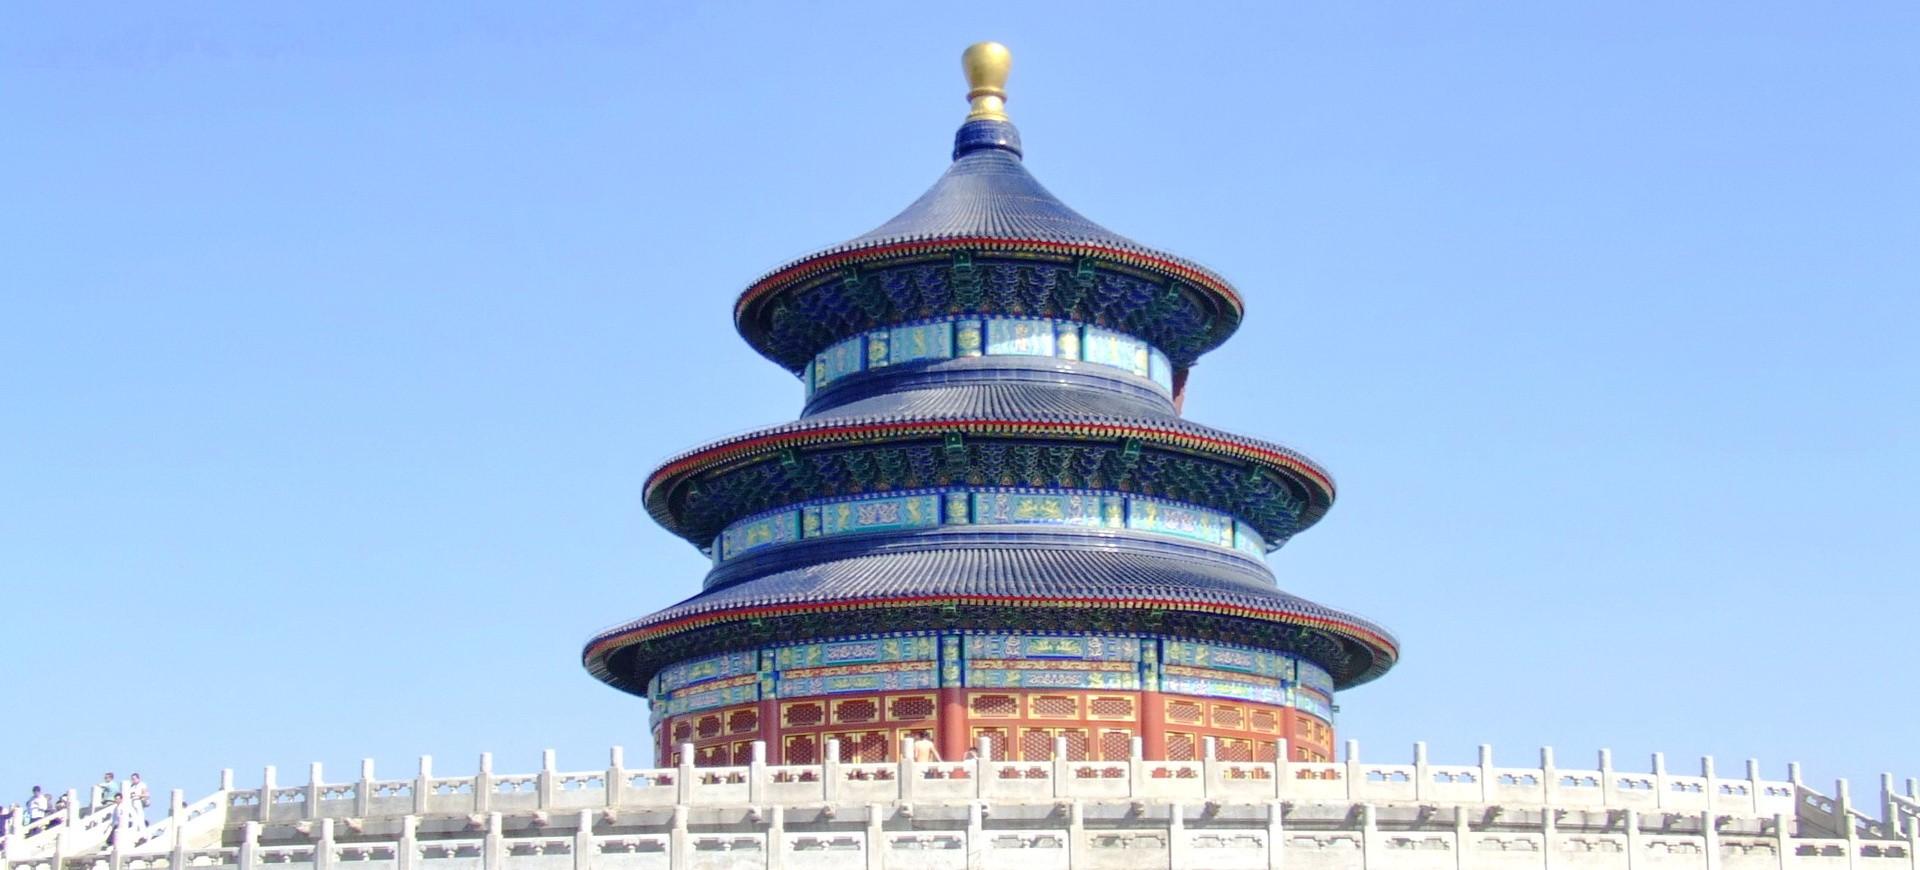 Chine Pékin Beijing Temple du Ciel